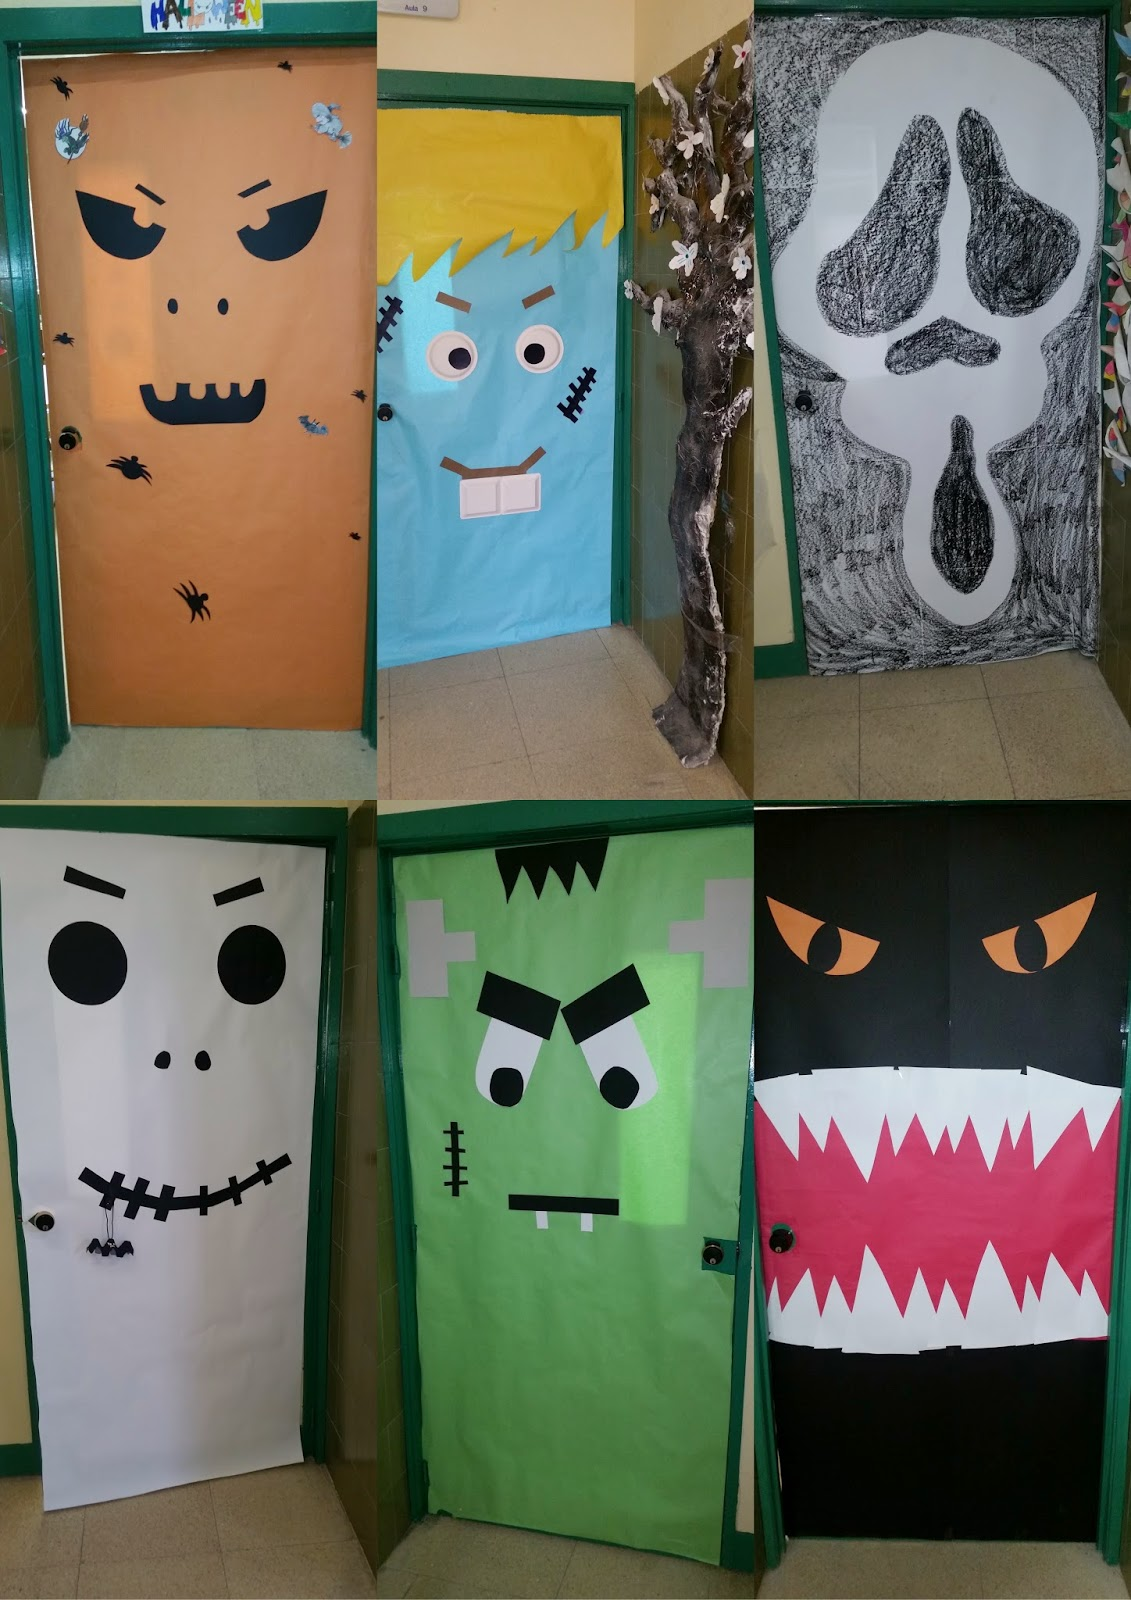 Halloween puertas 21 imagenes educativas for Puertas de halloween decoradas